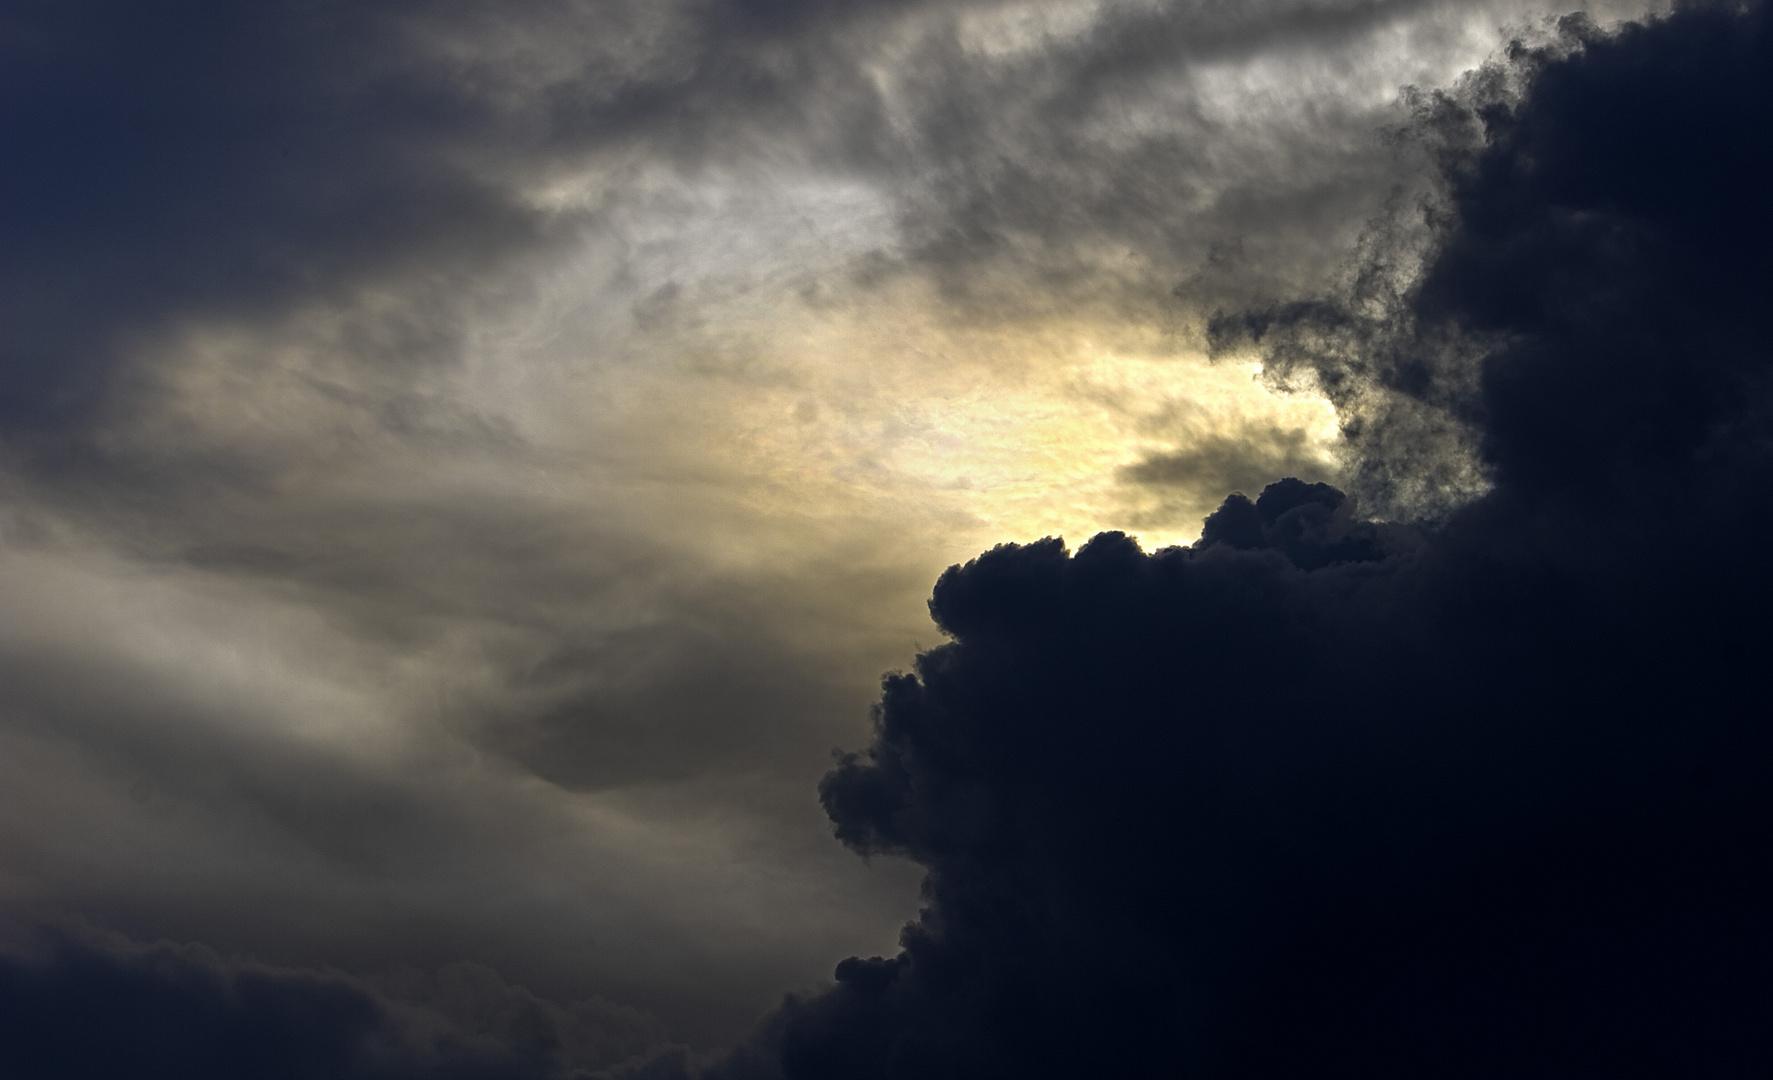 Wolkendynamik I